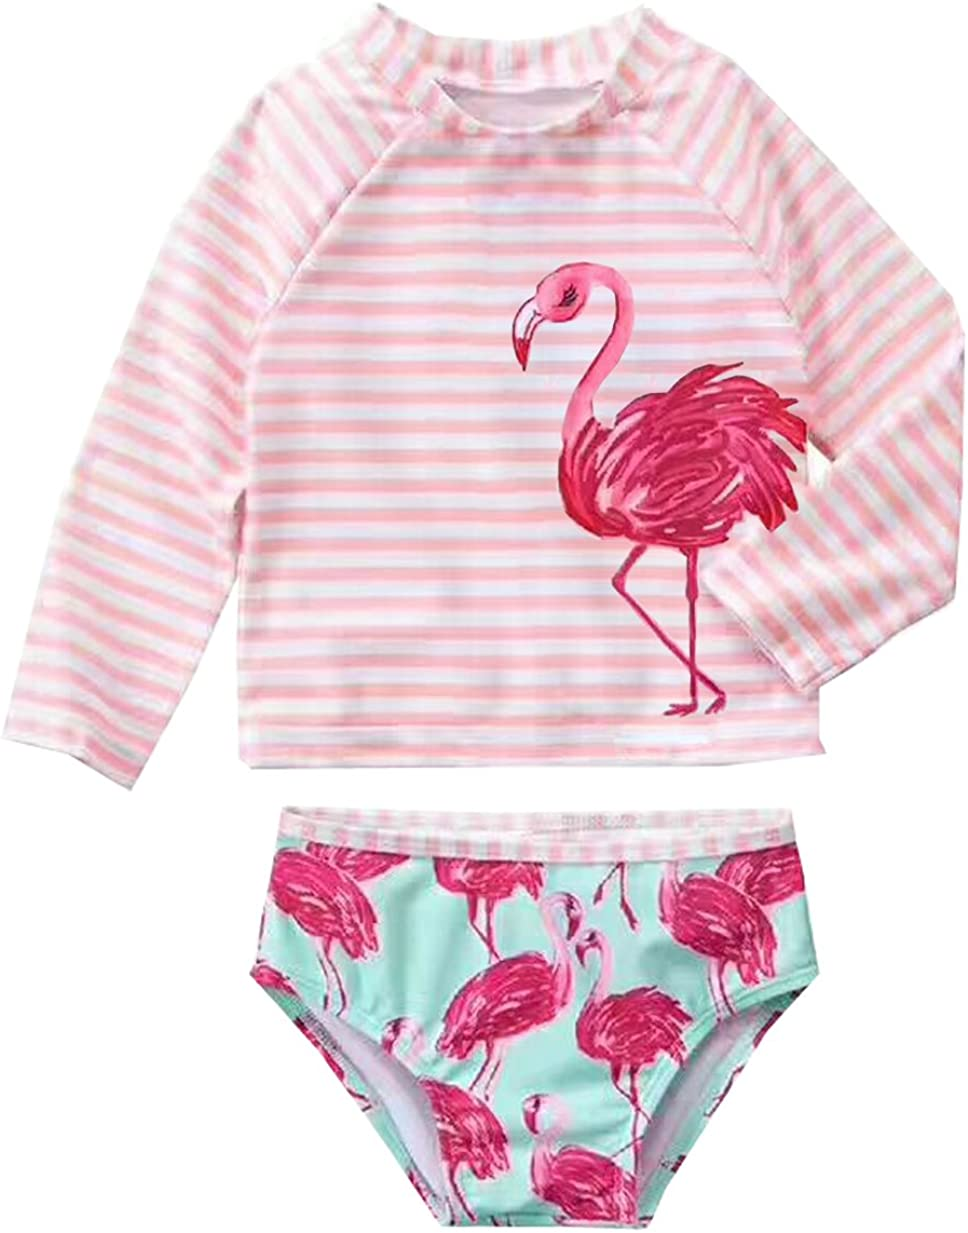 Infant Baby Girls Flamingo Rash Guard Sets Girl Stripe Swimwear Long Sleeve Swimsuit UPF50+